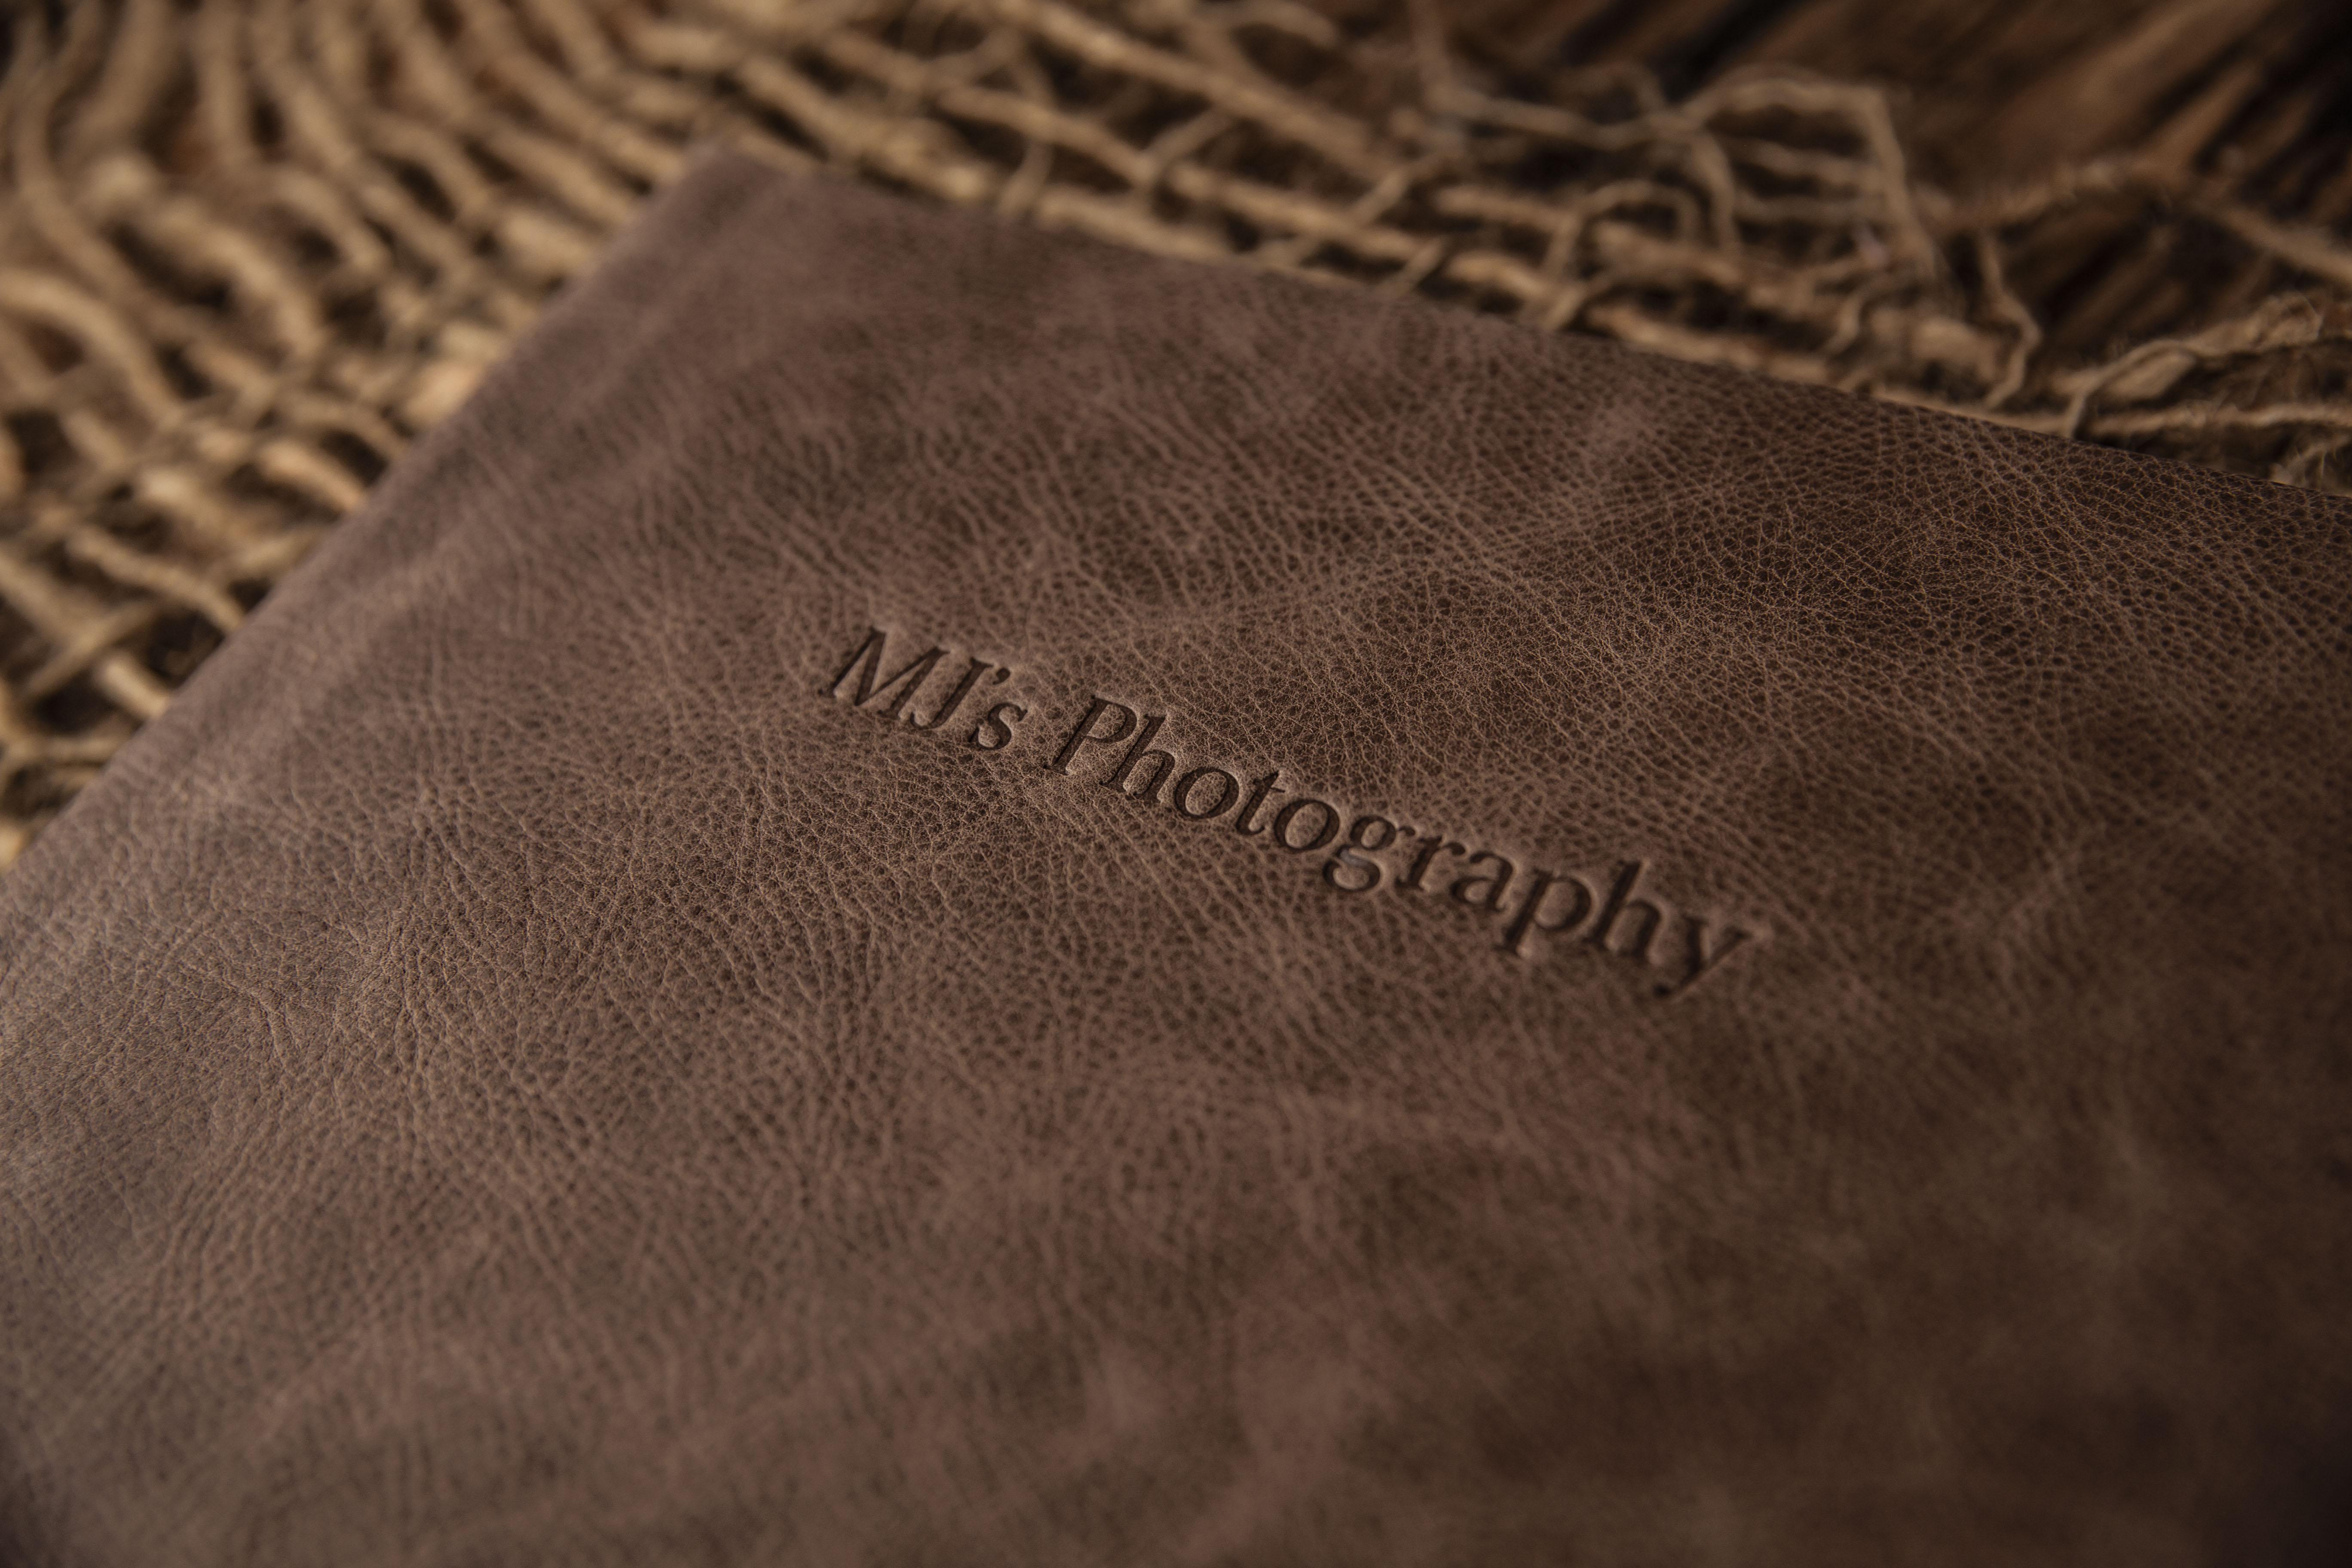 Fulshearphotographer